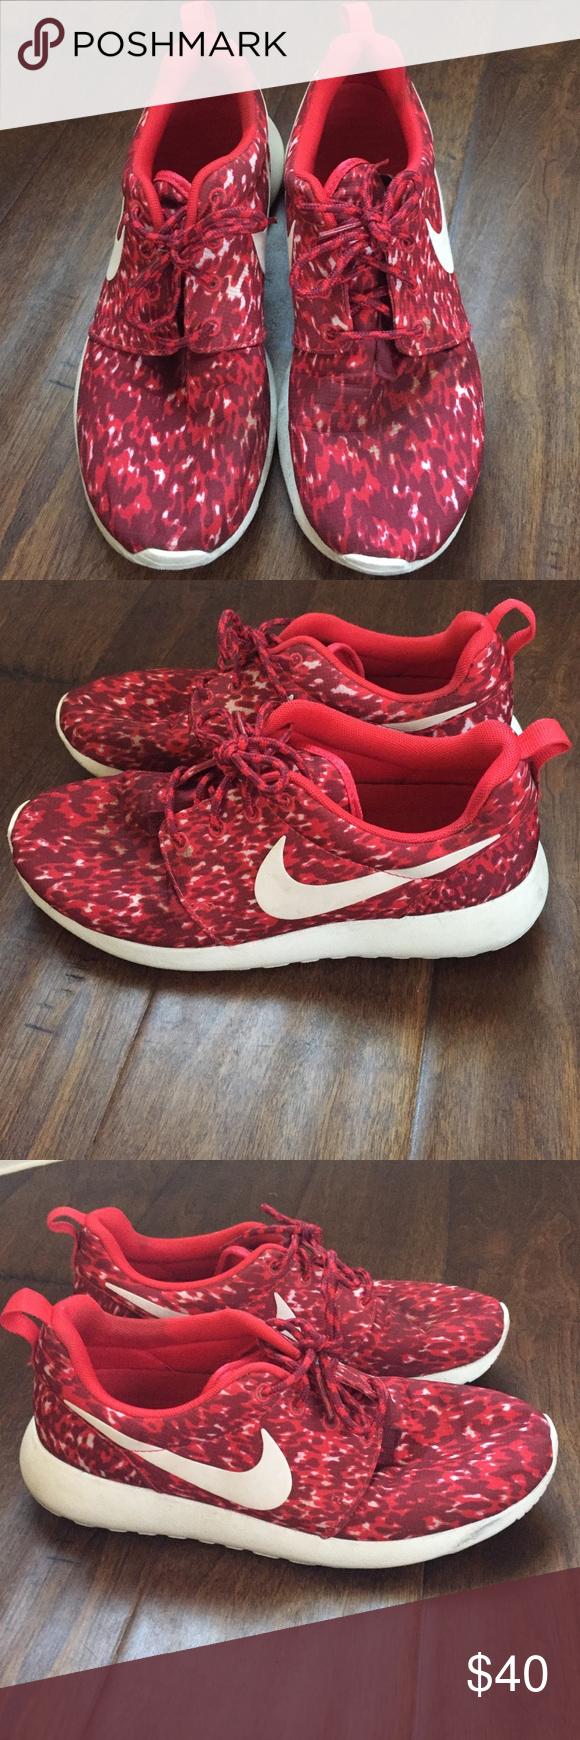 Roshe runs Women's roshe runs size 7. Nike Shoes Athletic Shoes